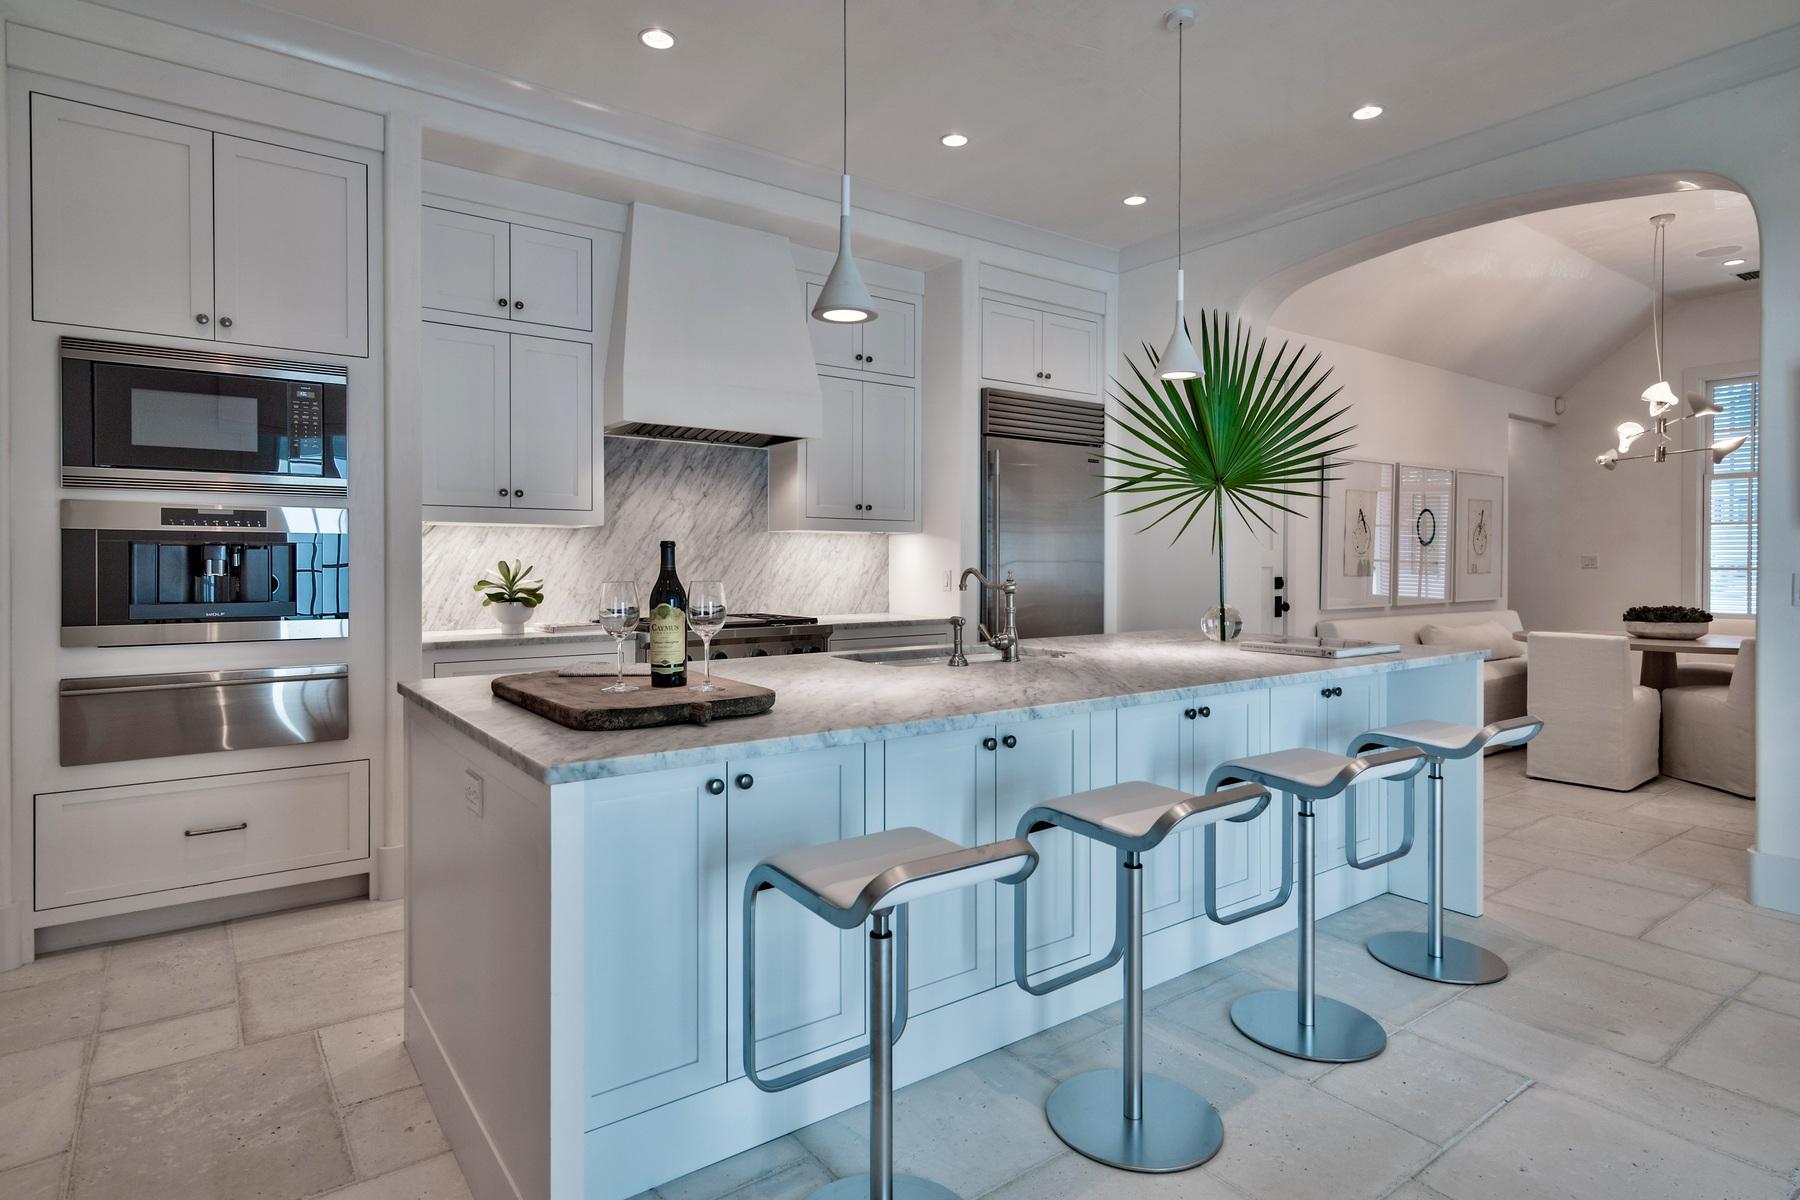 獨棟家庭住宅 為 出售 在 STUNNING NEW CONSTRUCTION ON ICONIC STREET NEAR LUXURY AMENITIES 45 N Charles Street Alys Beach, 佛羅里達州, 32461 美國